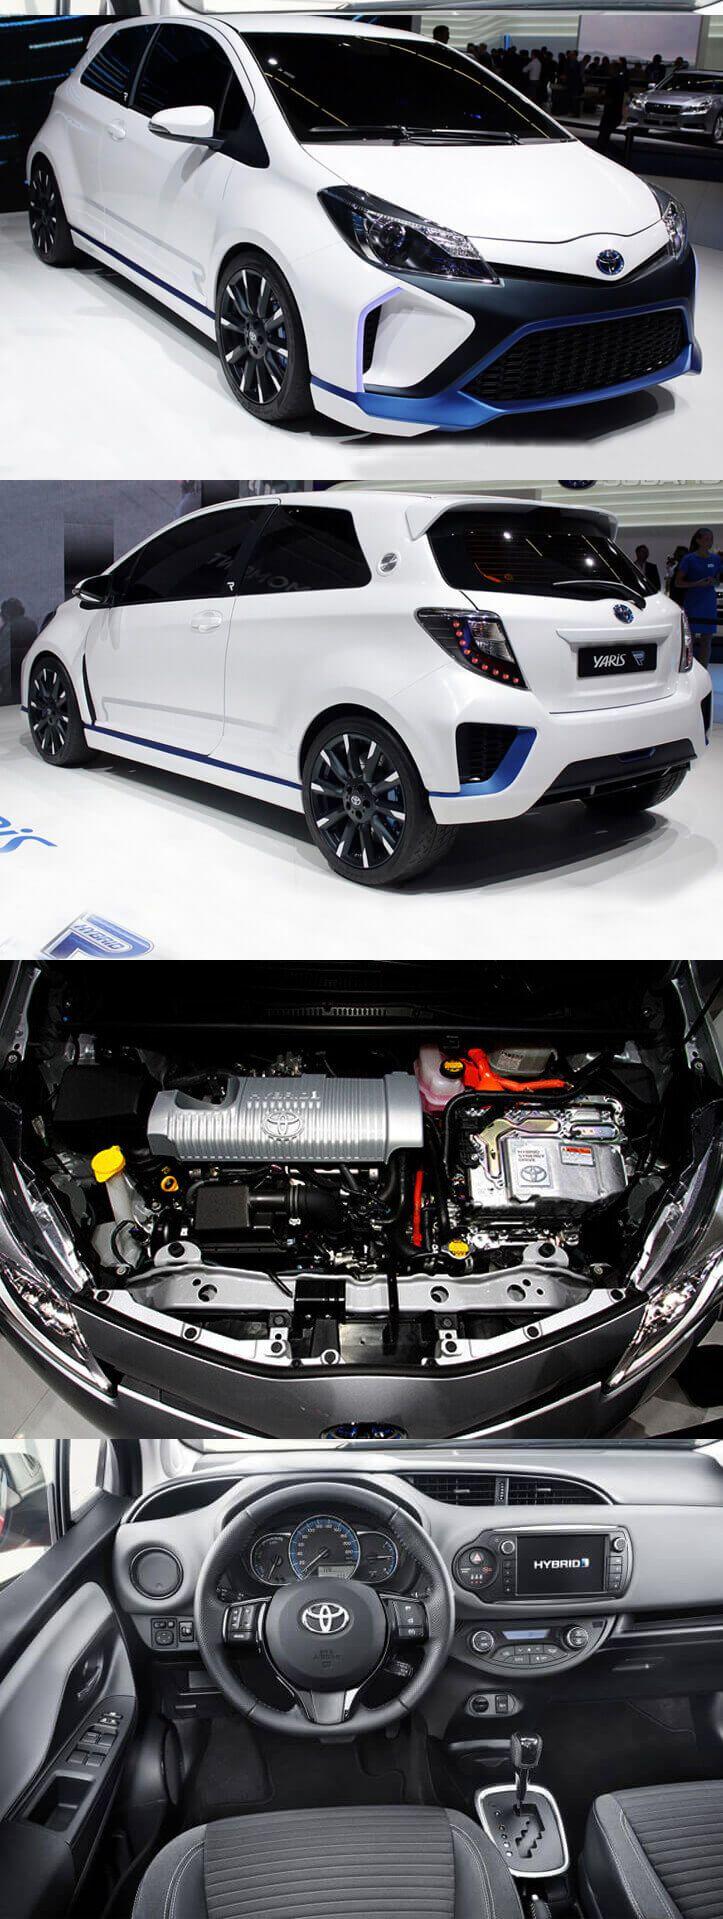 2016 Toyota Yaris Hybrid https://www.amazon.co.uk/Baby-Car-Mirror-Shatterproof-Installation/dp/B06XHG6SSY